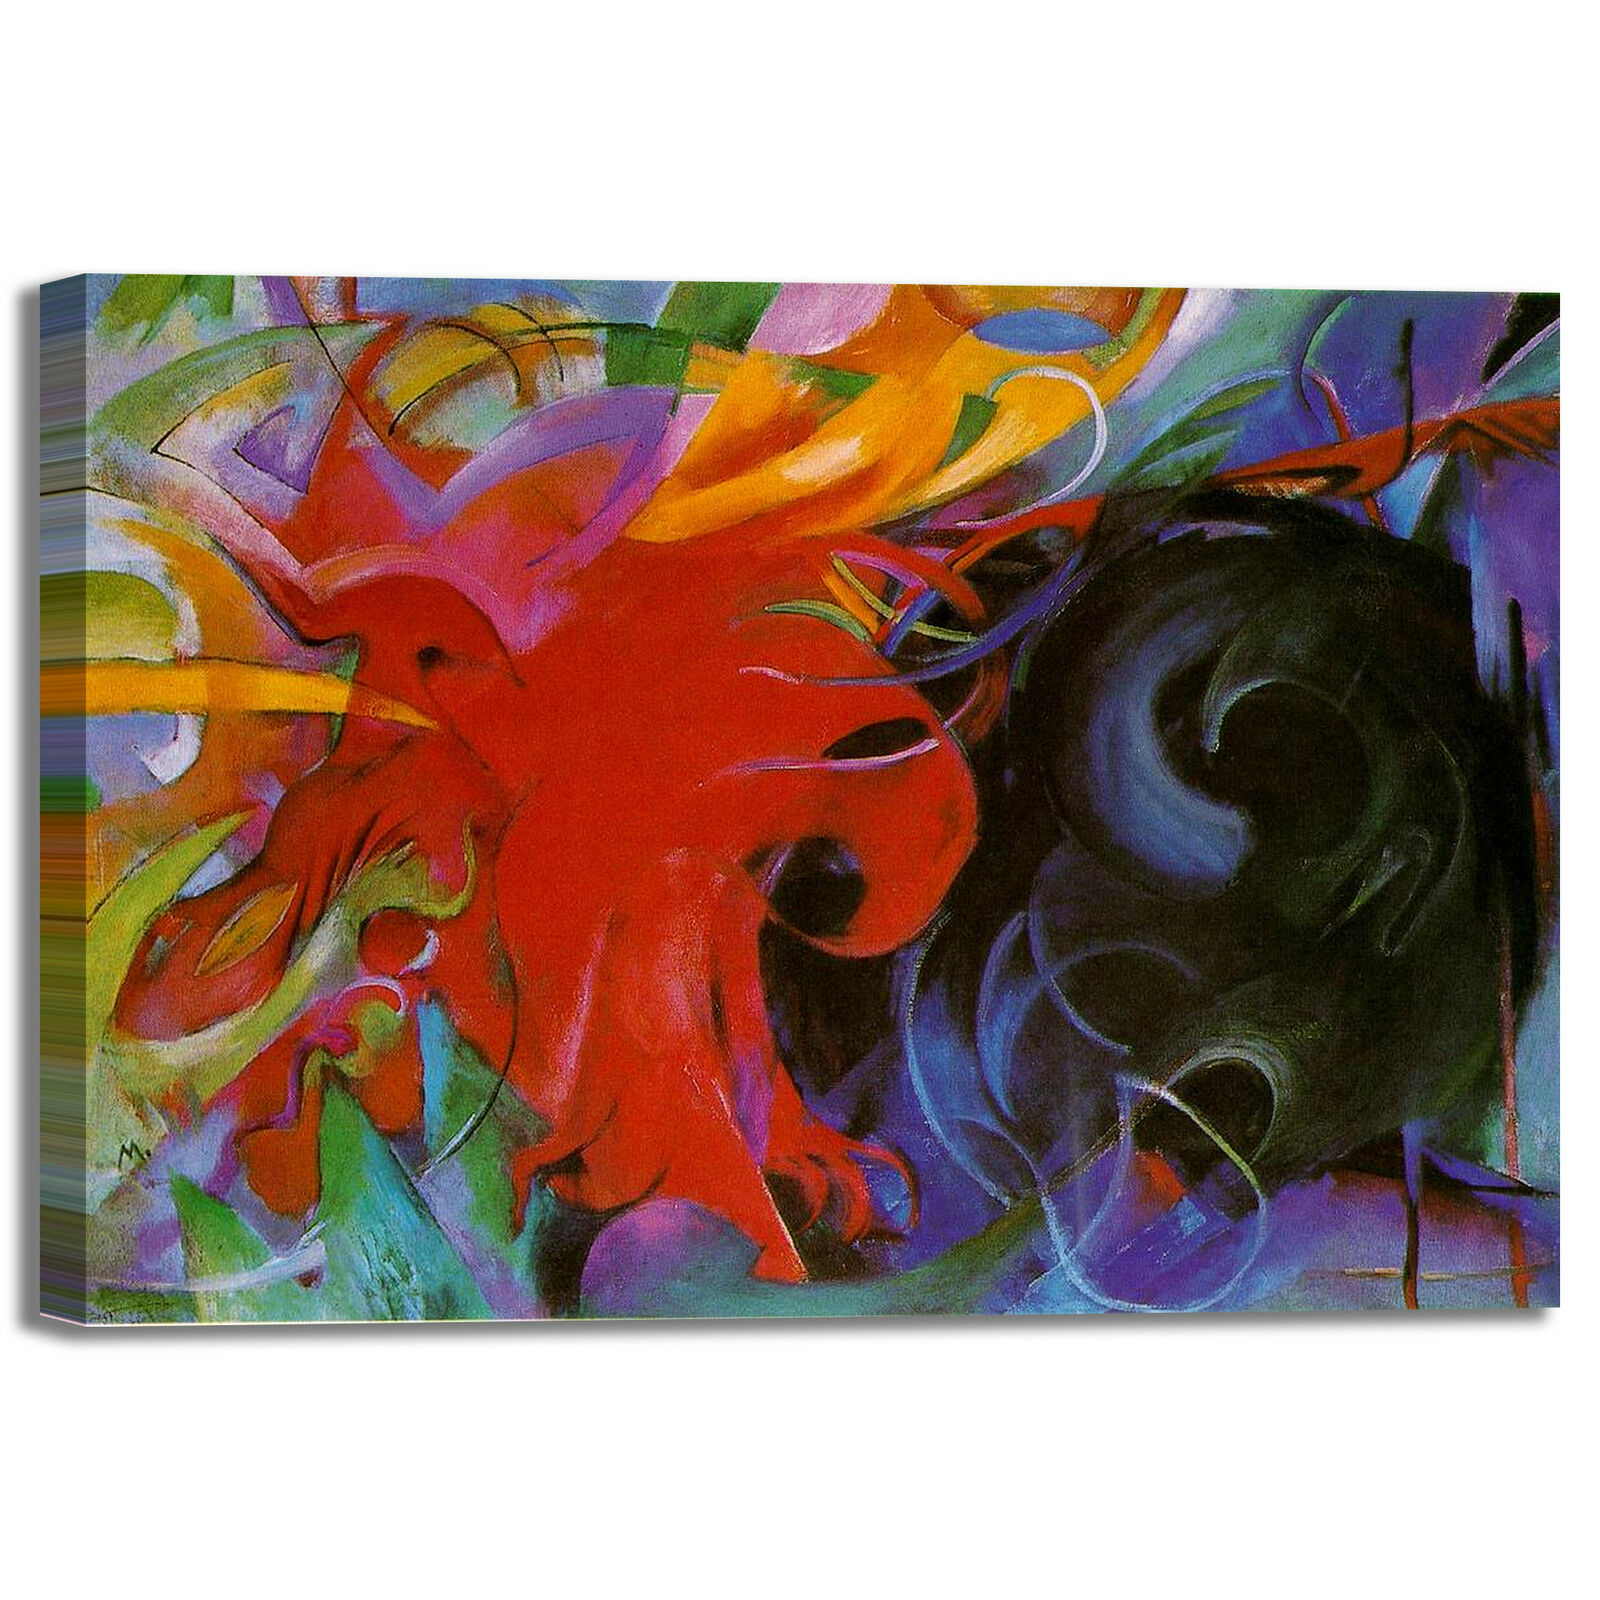 Franz to Marc forme di combattiHommes to Franz quadro stampa tela dipinto telaio arRouge o casa 05acb9